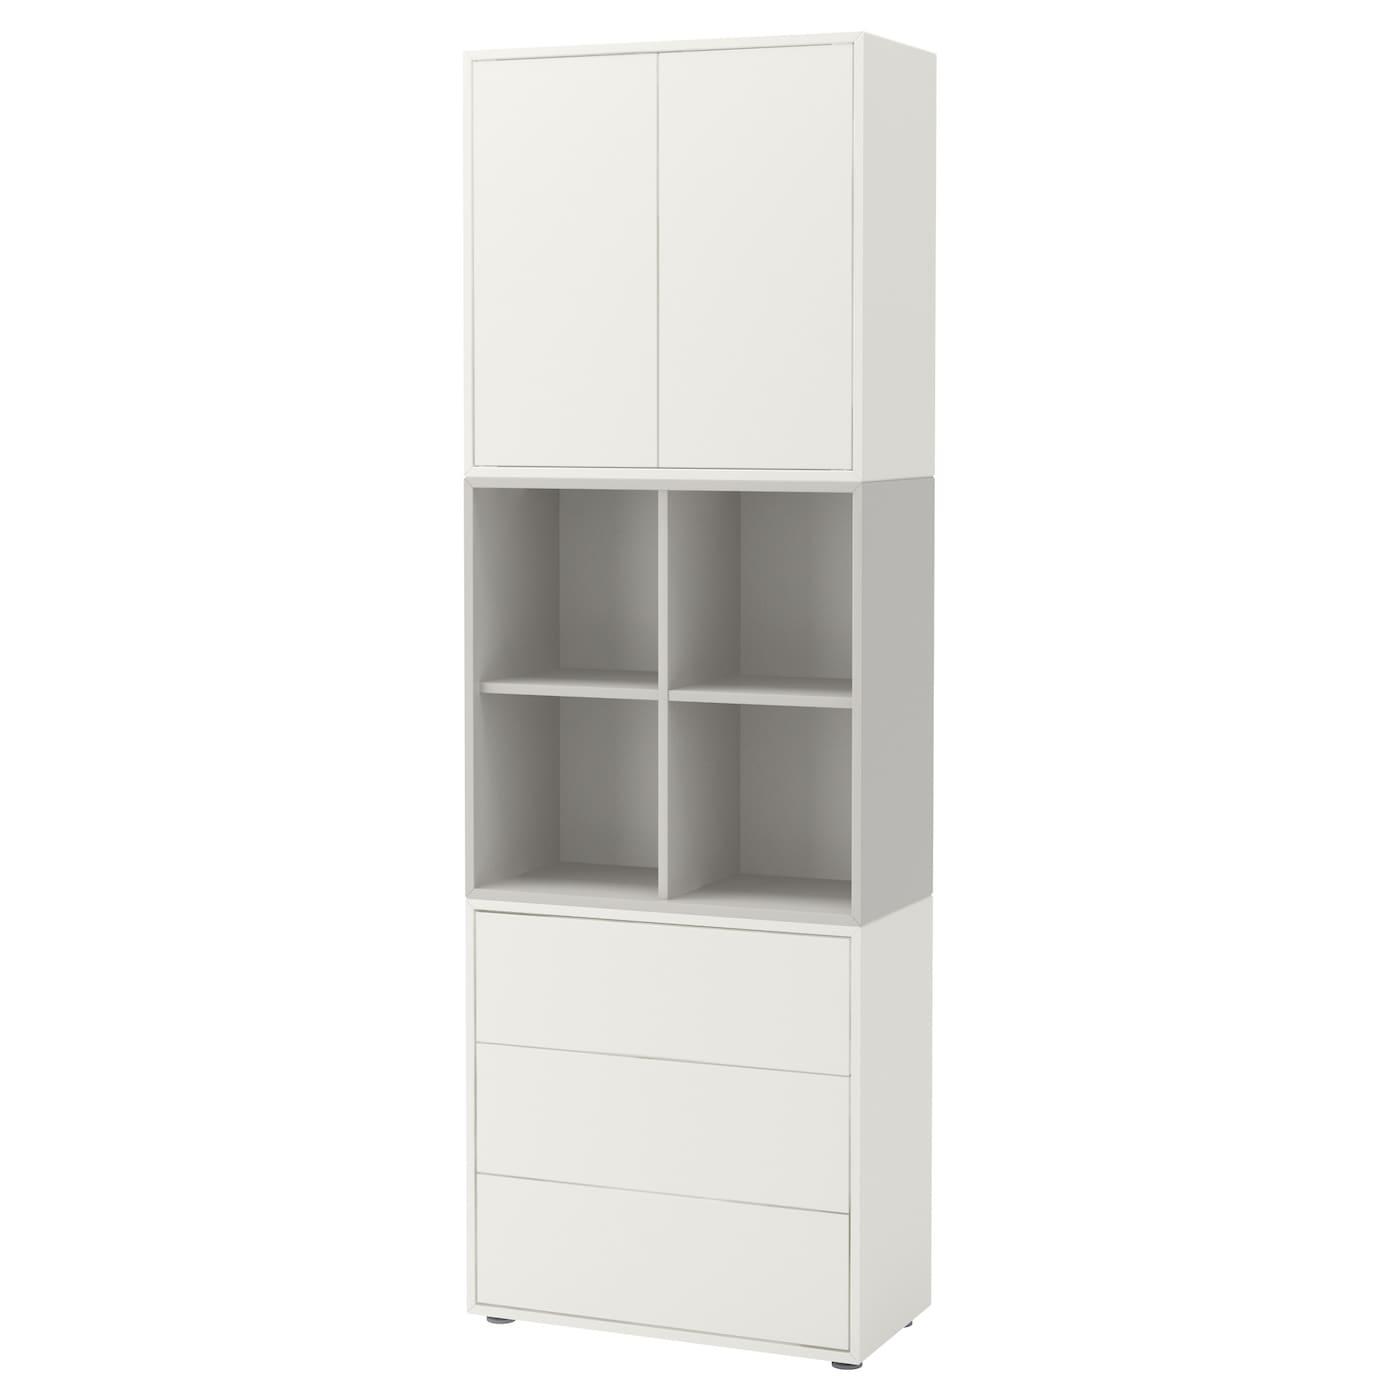 Ikea Eket Cabinet Combination With Feet